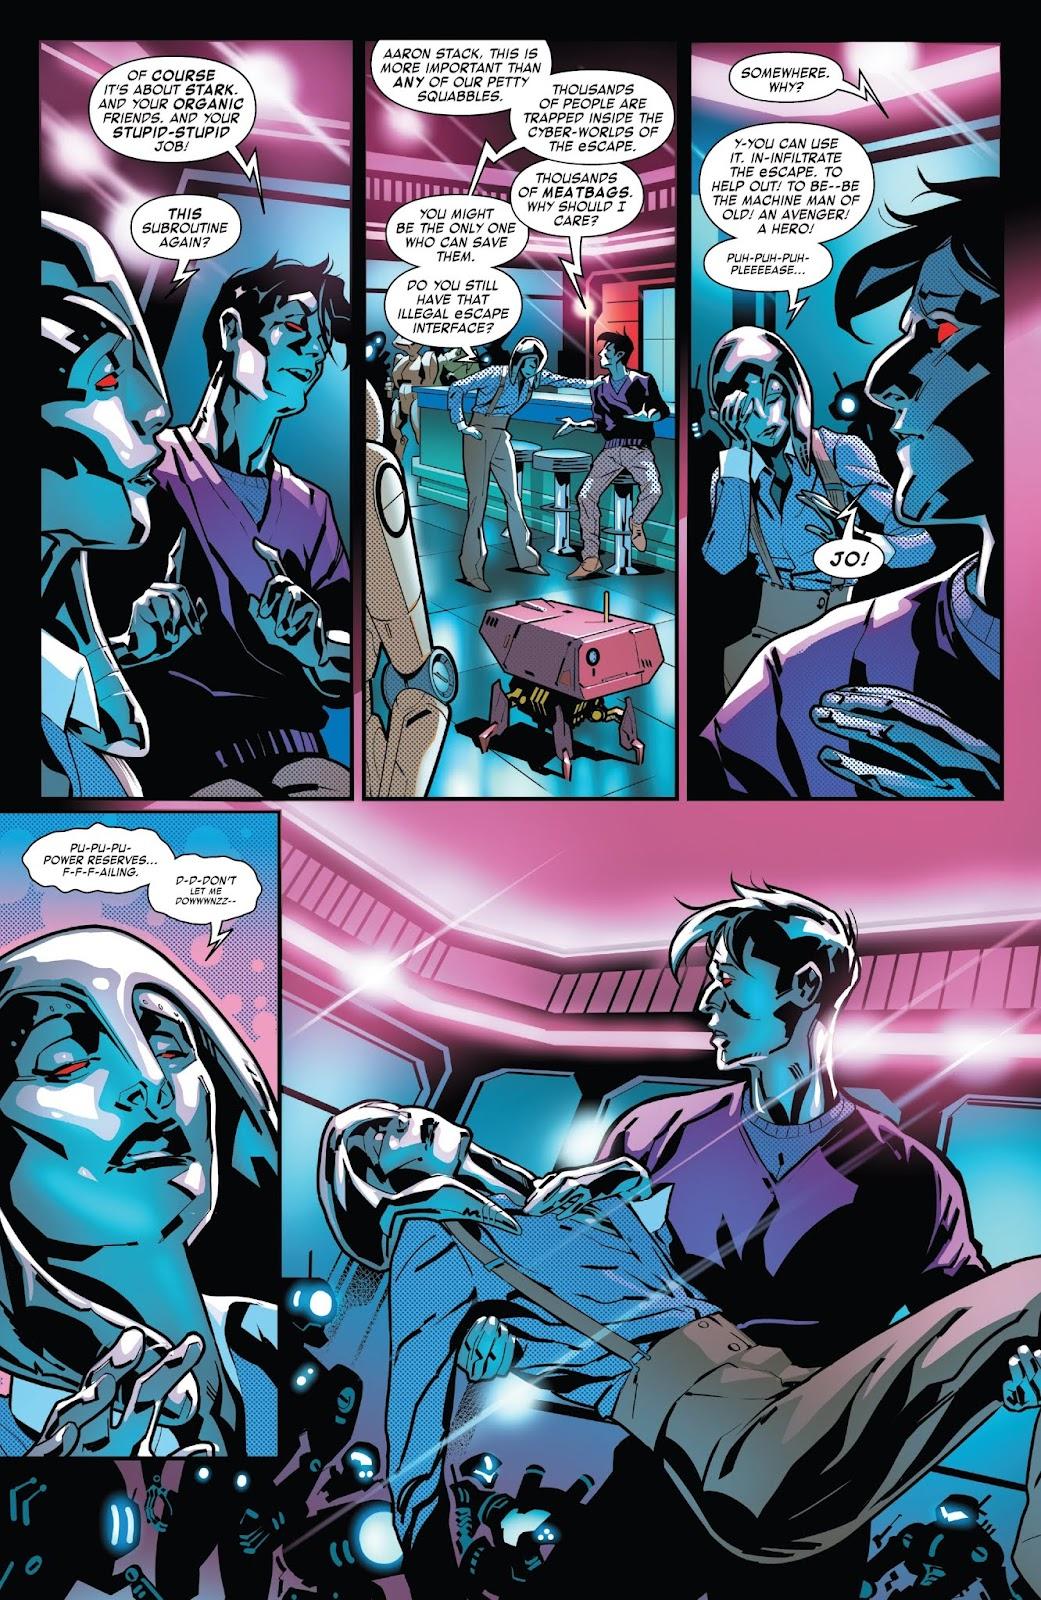 Read online Tony Stark: Iron Man comic -  Issue #7 - 18